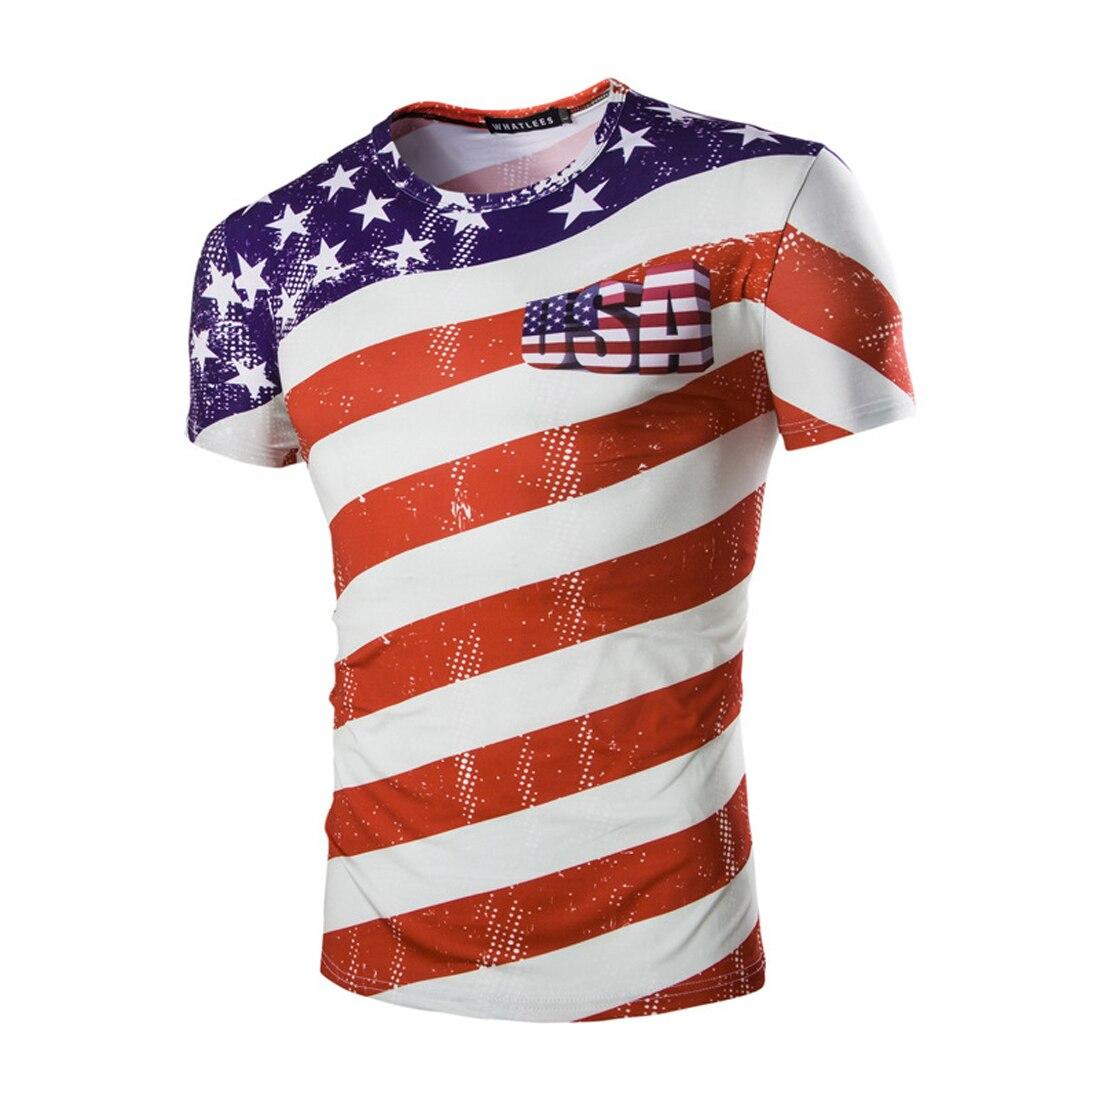 Shirt design usa - Usa Flag Printed Striped Shirts T Shirt Men Short Sleeve Stylish Summer Camisa Masculina 2017 Top